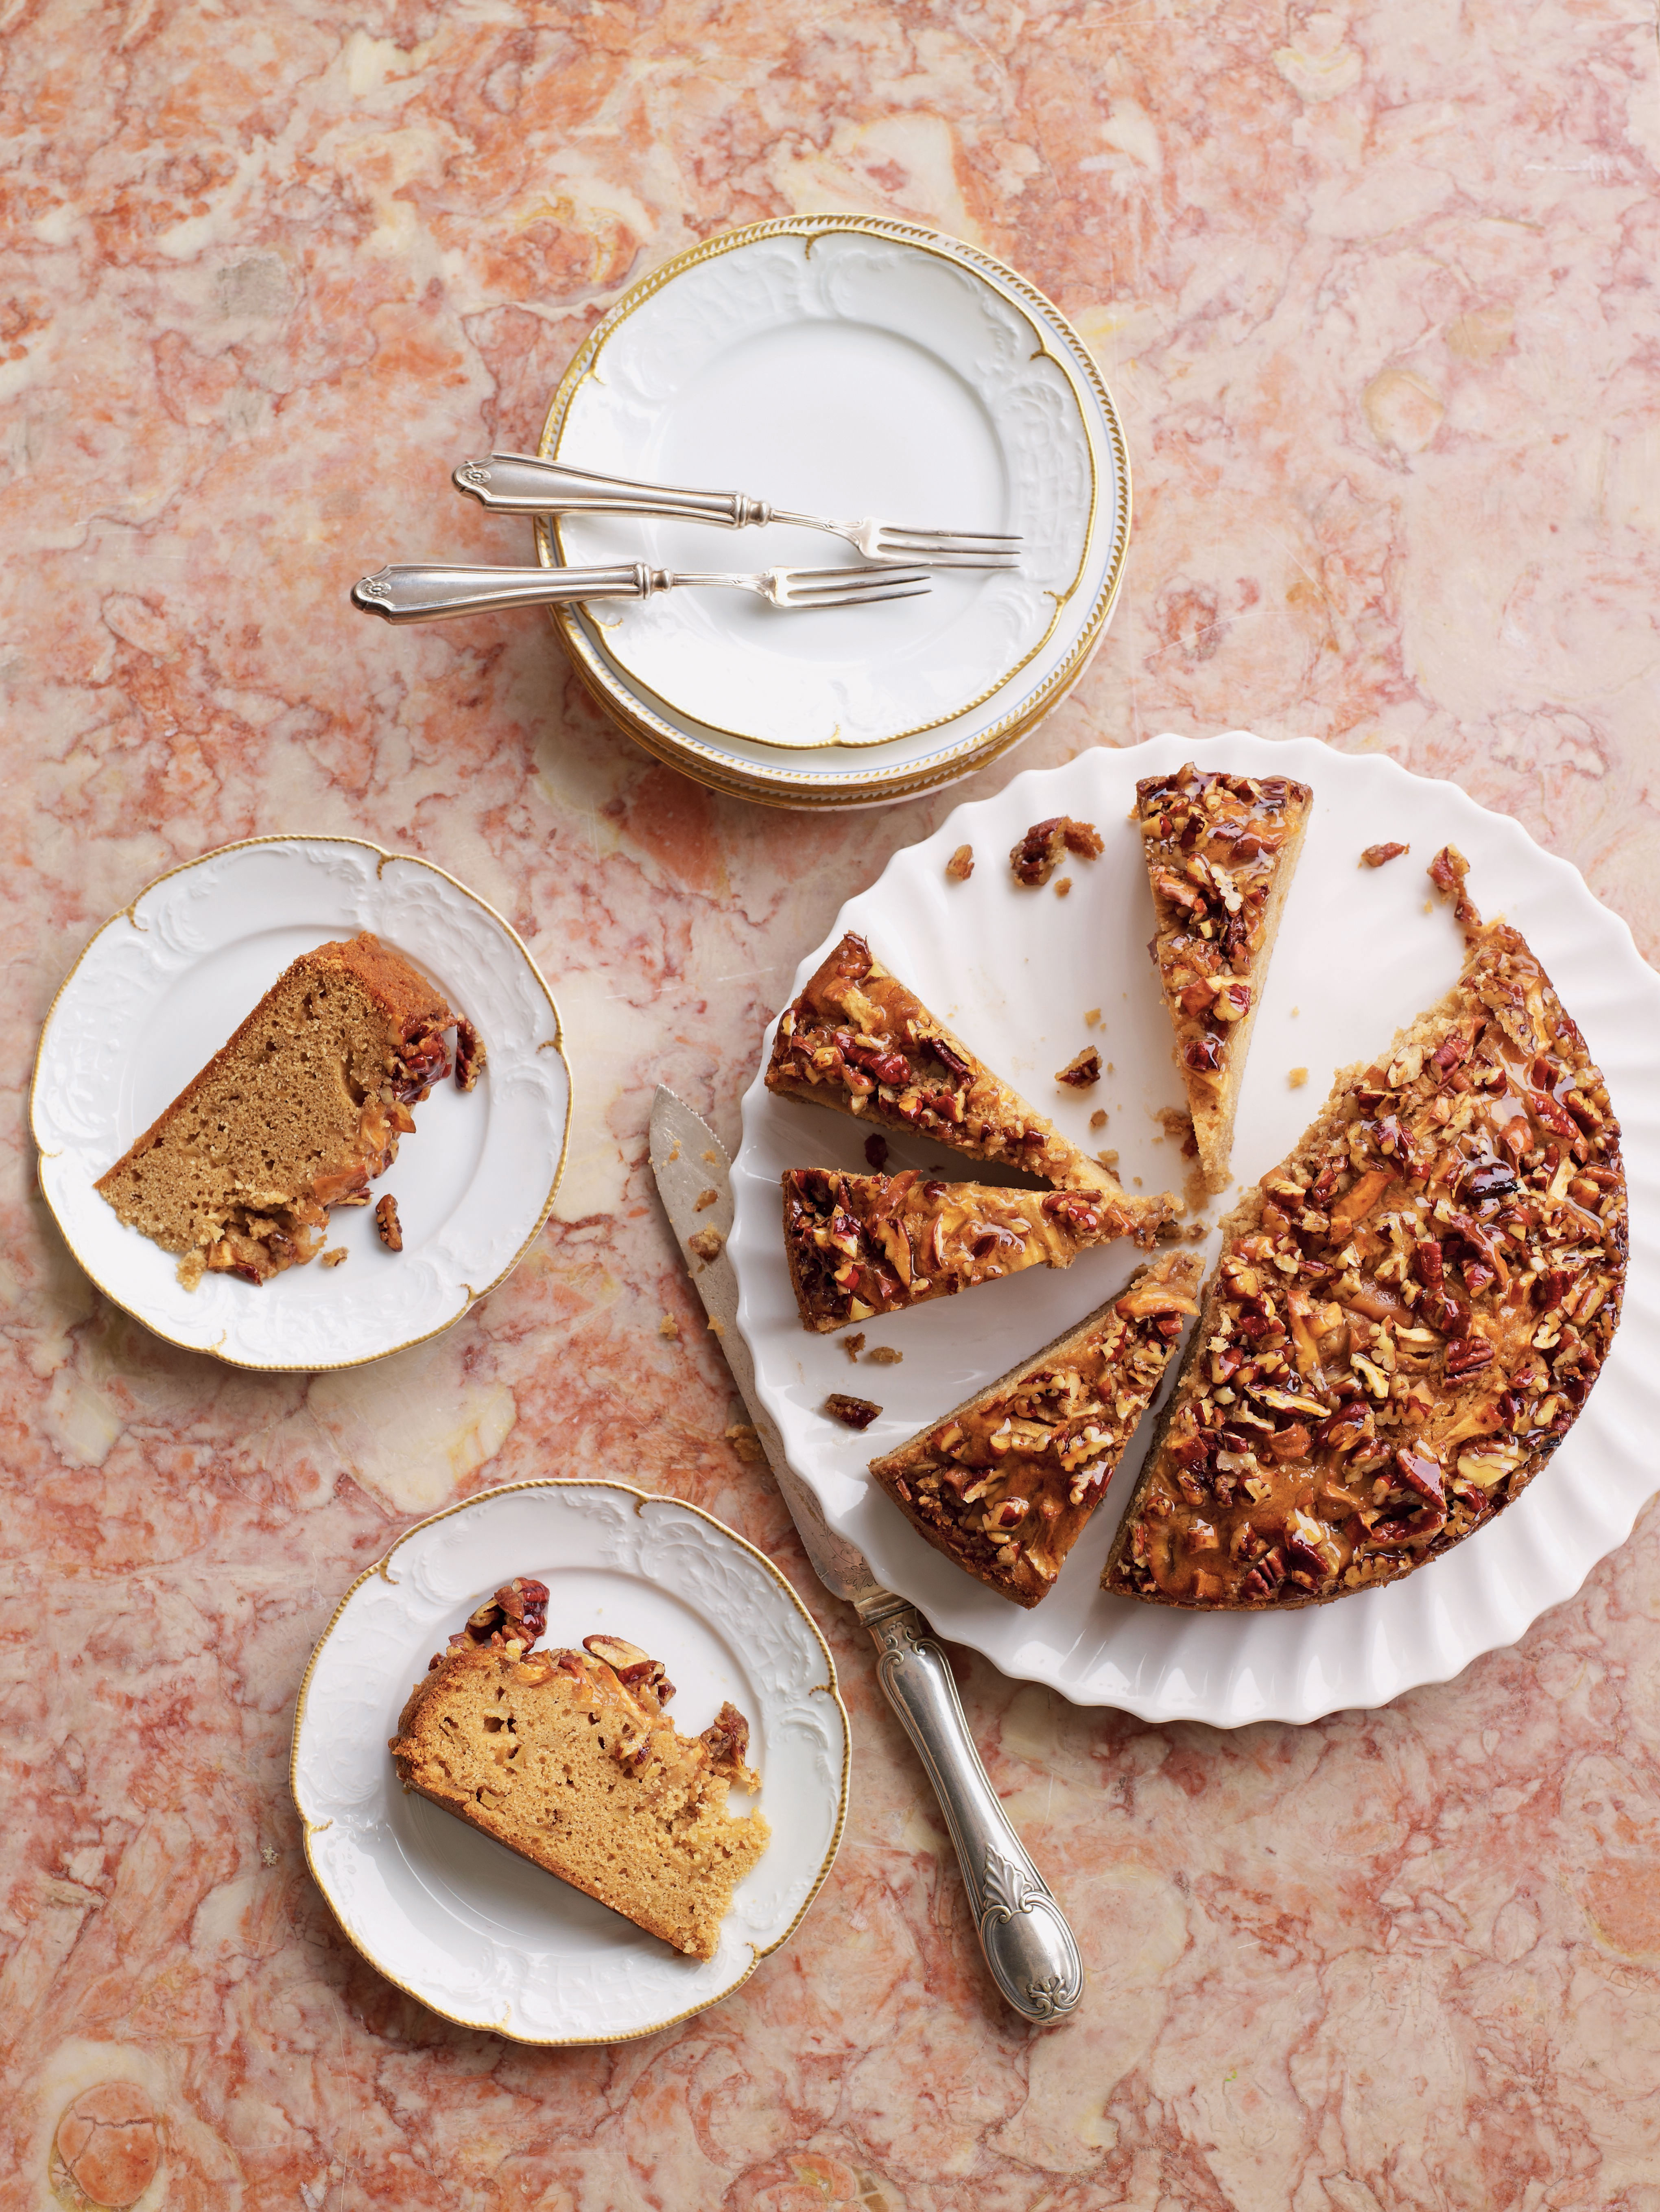 Eric Lanlard's Sticky Pecan Cake